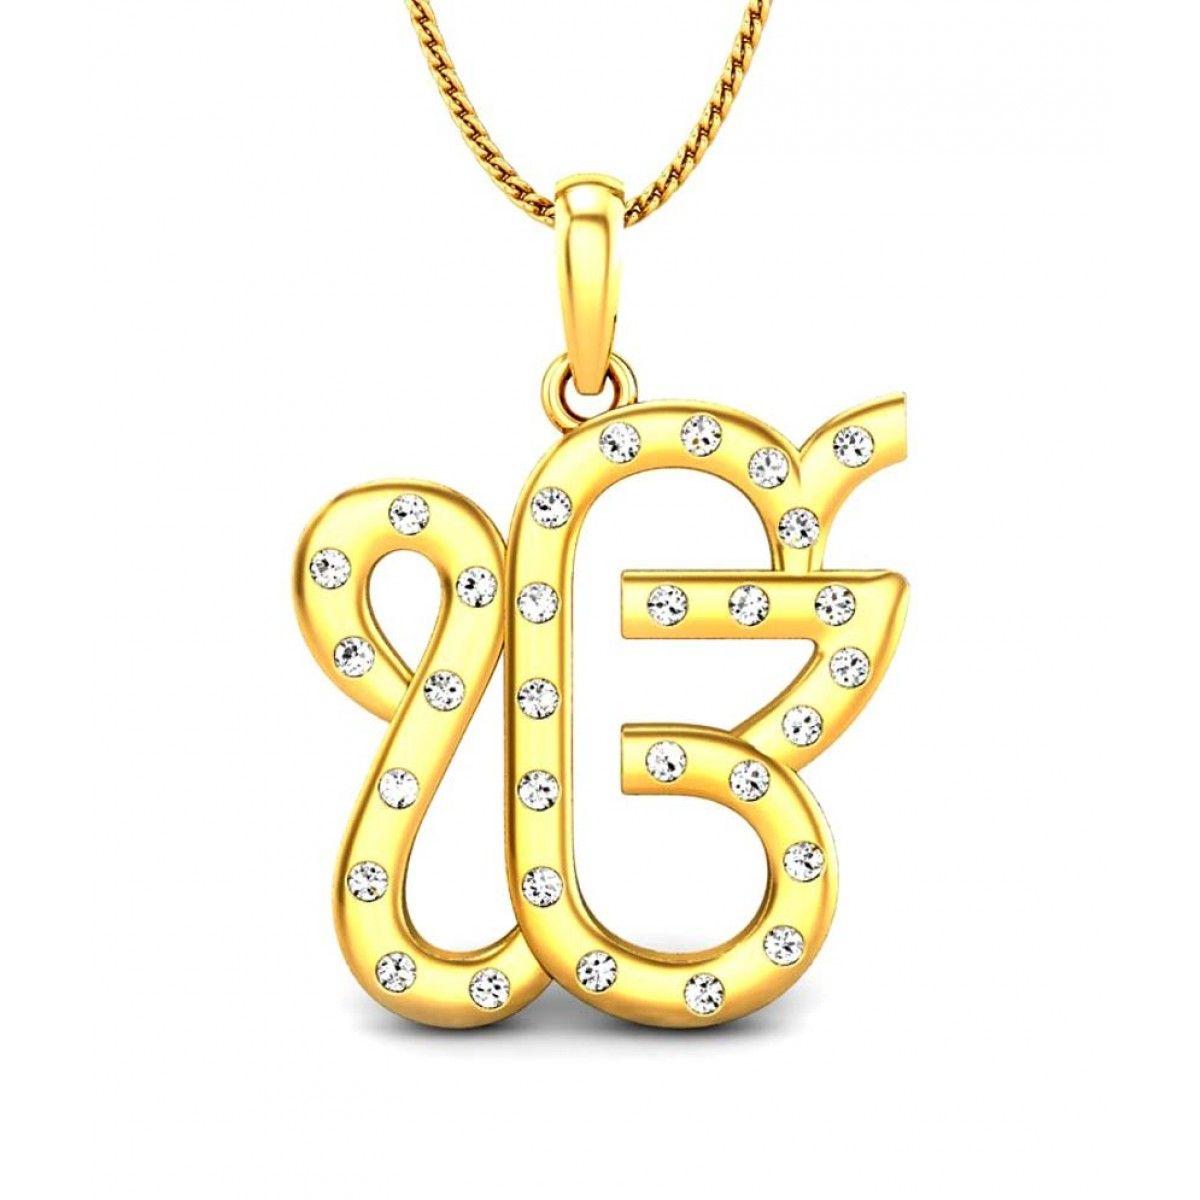 Kataria jewellers ek onkar guru nanak sikh pendant in bis hallmarked kataria jewellers ek onkar guru nanak sikh pendant in bis hallmarked 925 aloadofball Images